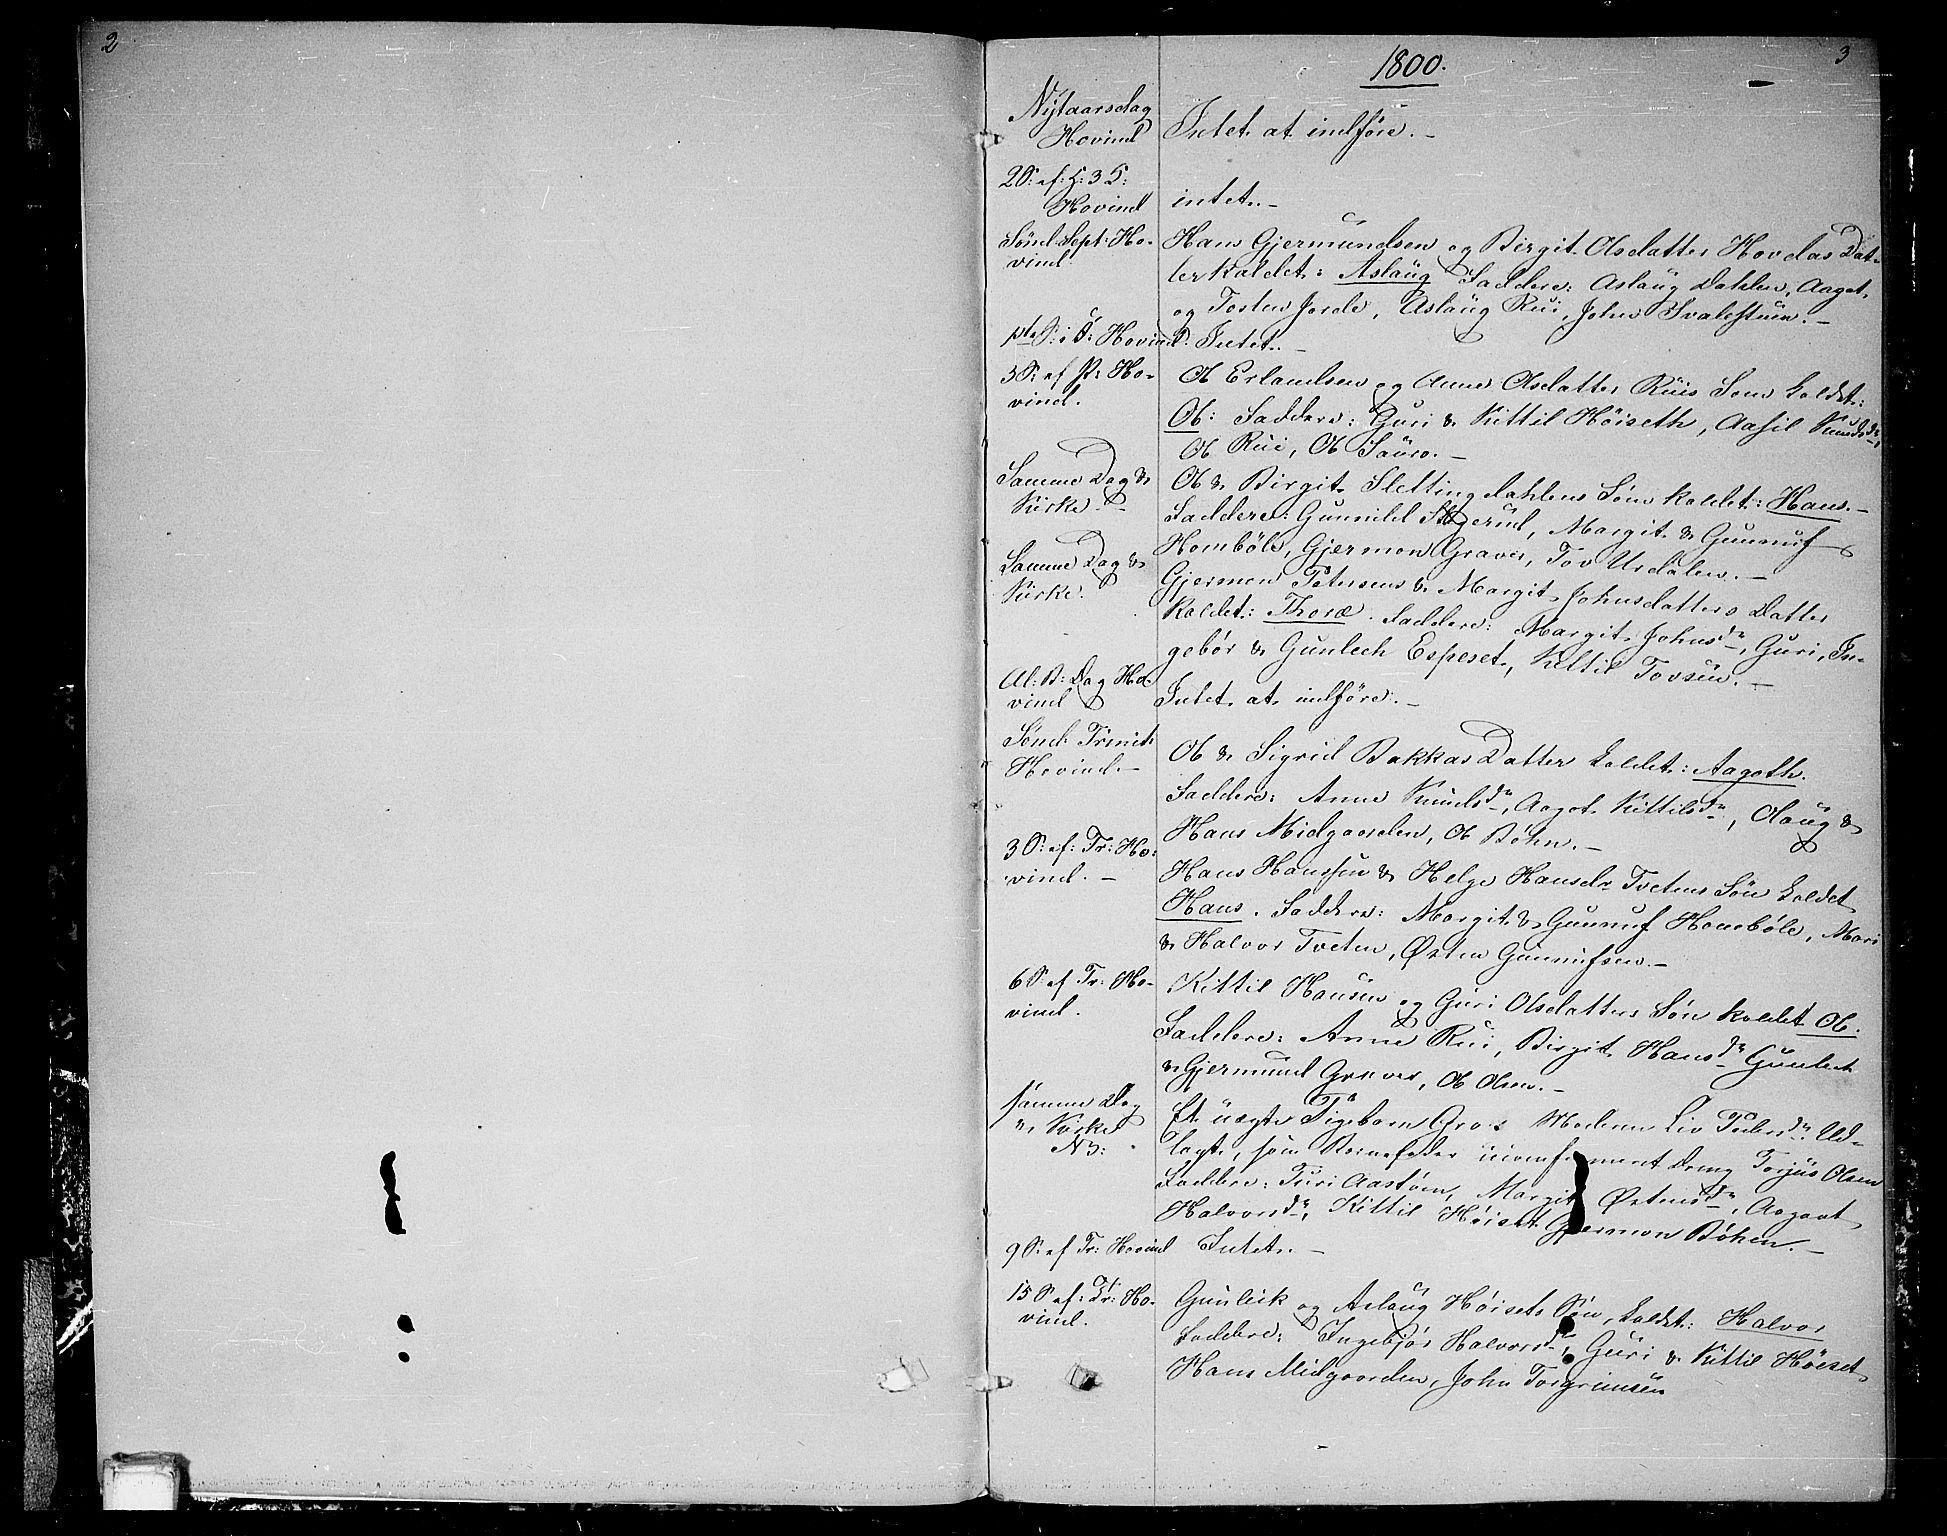 SAKO, Gransherad kirkebøker, F/Fb/L0001: Ministerialbok nr. II 1, 1800-1814, s. 2-3